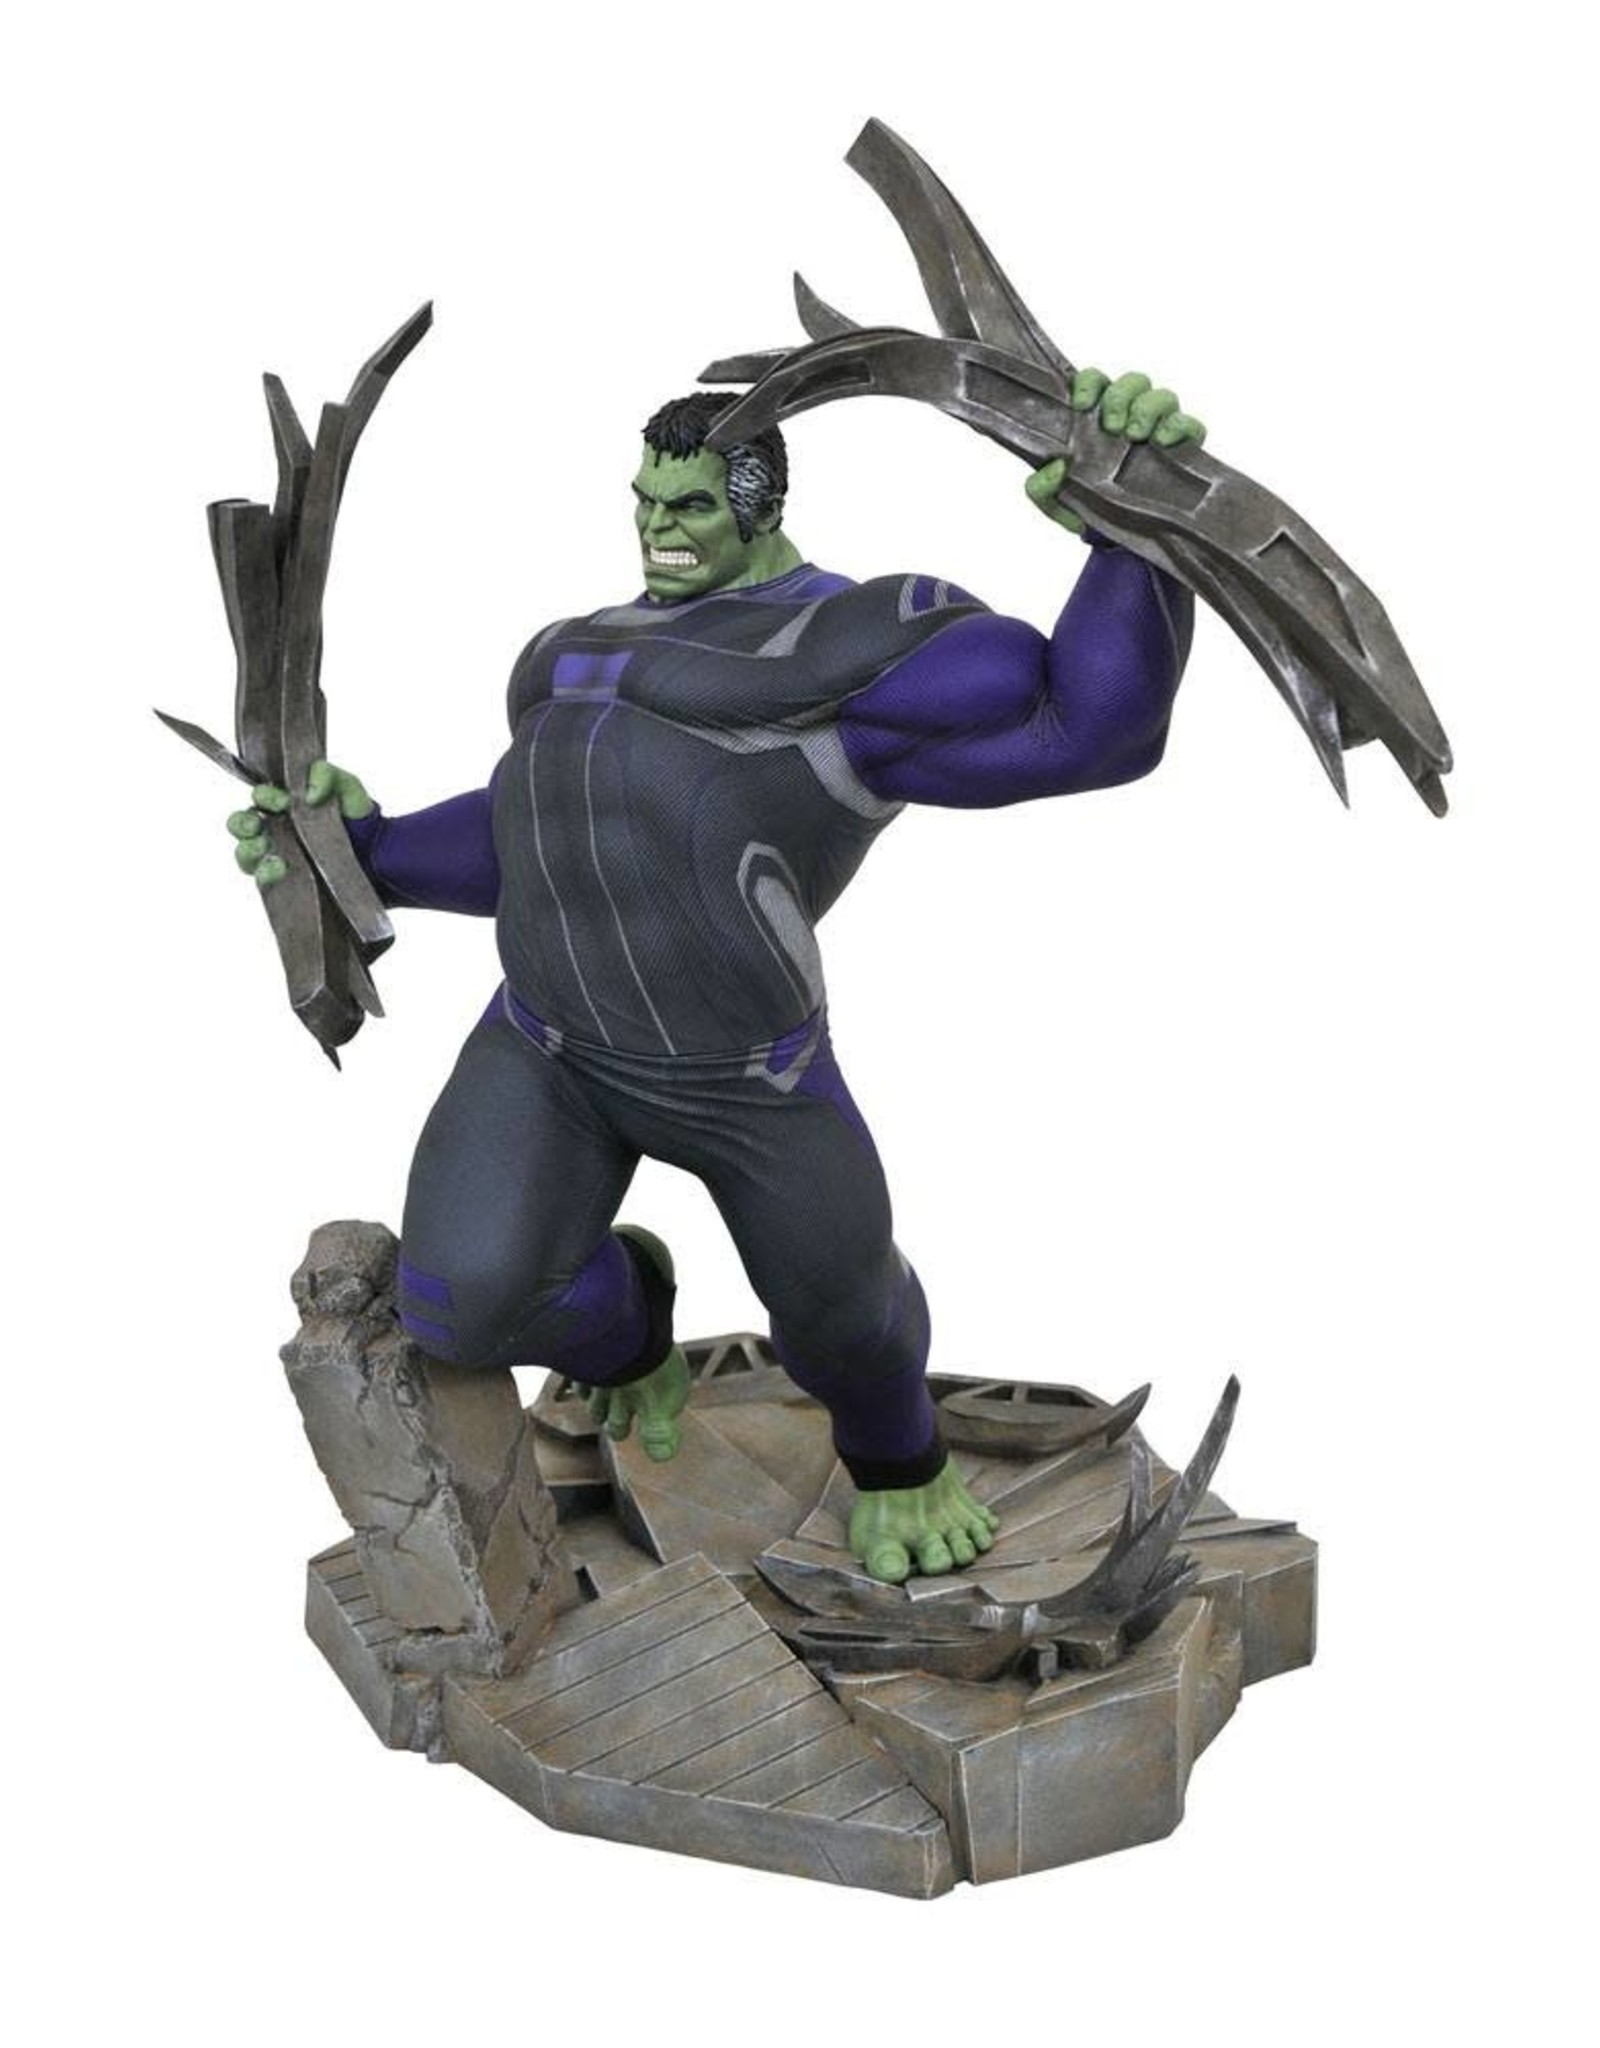 Diamond Select AVENGERS ENDGAME Diorama Comic Gallery 23cm - Tracksuit Hulk